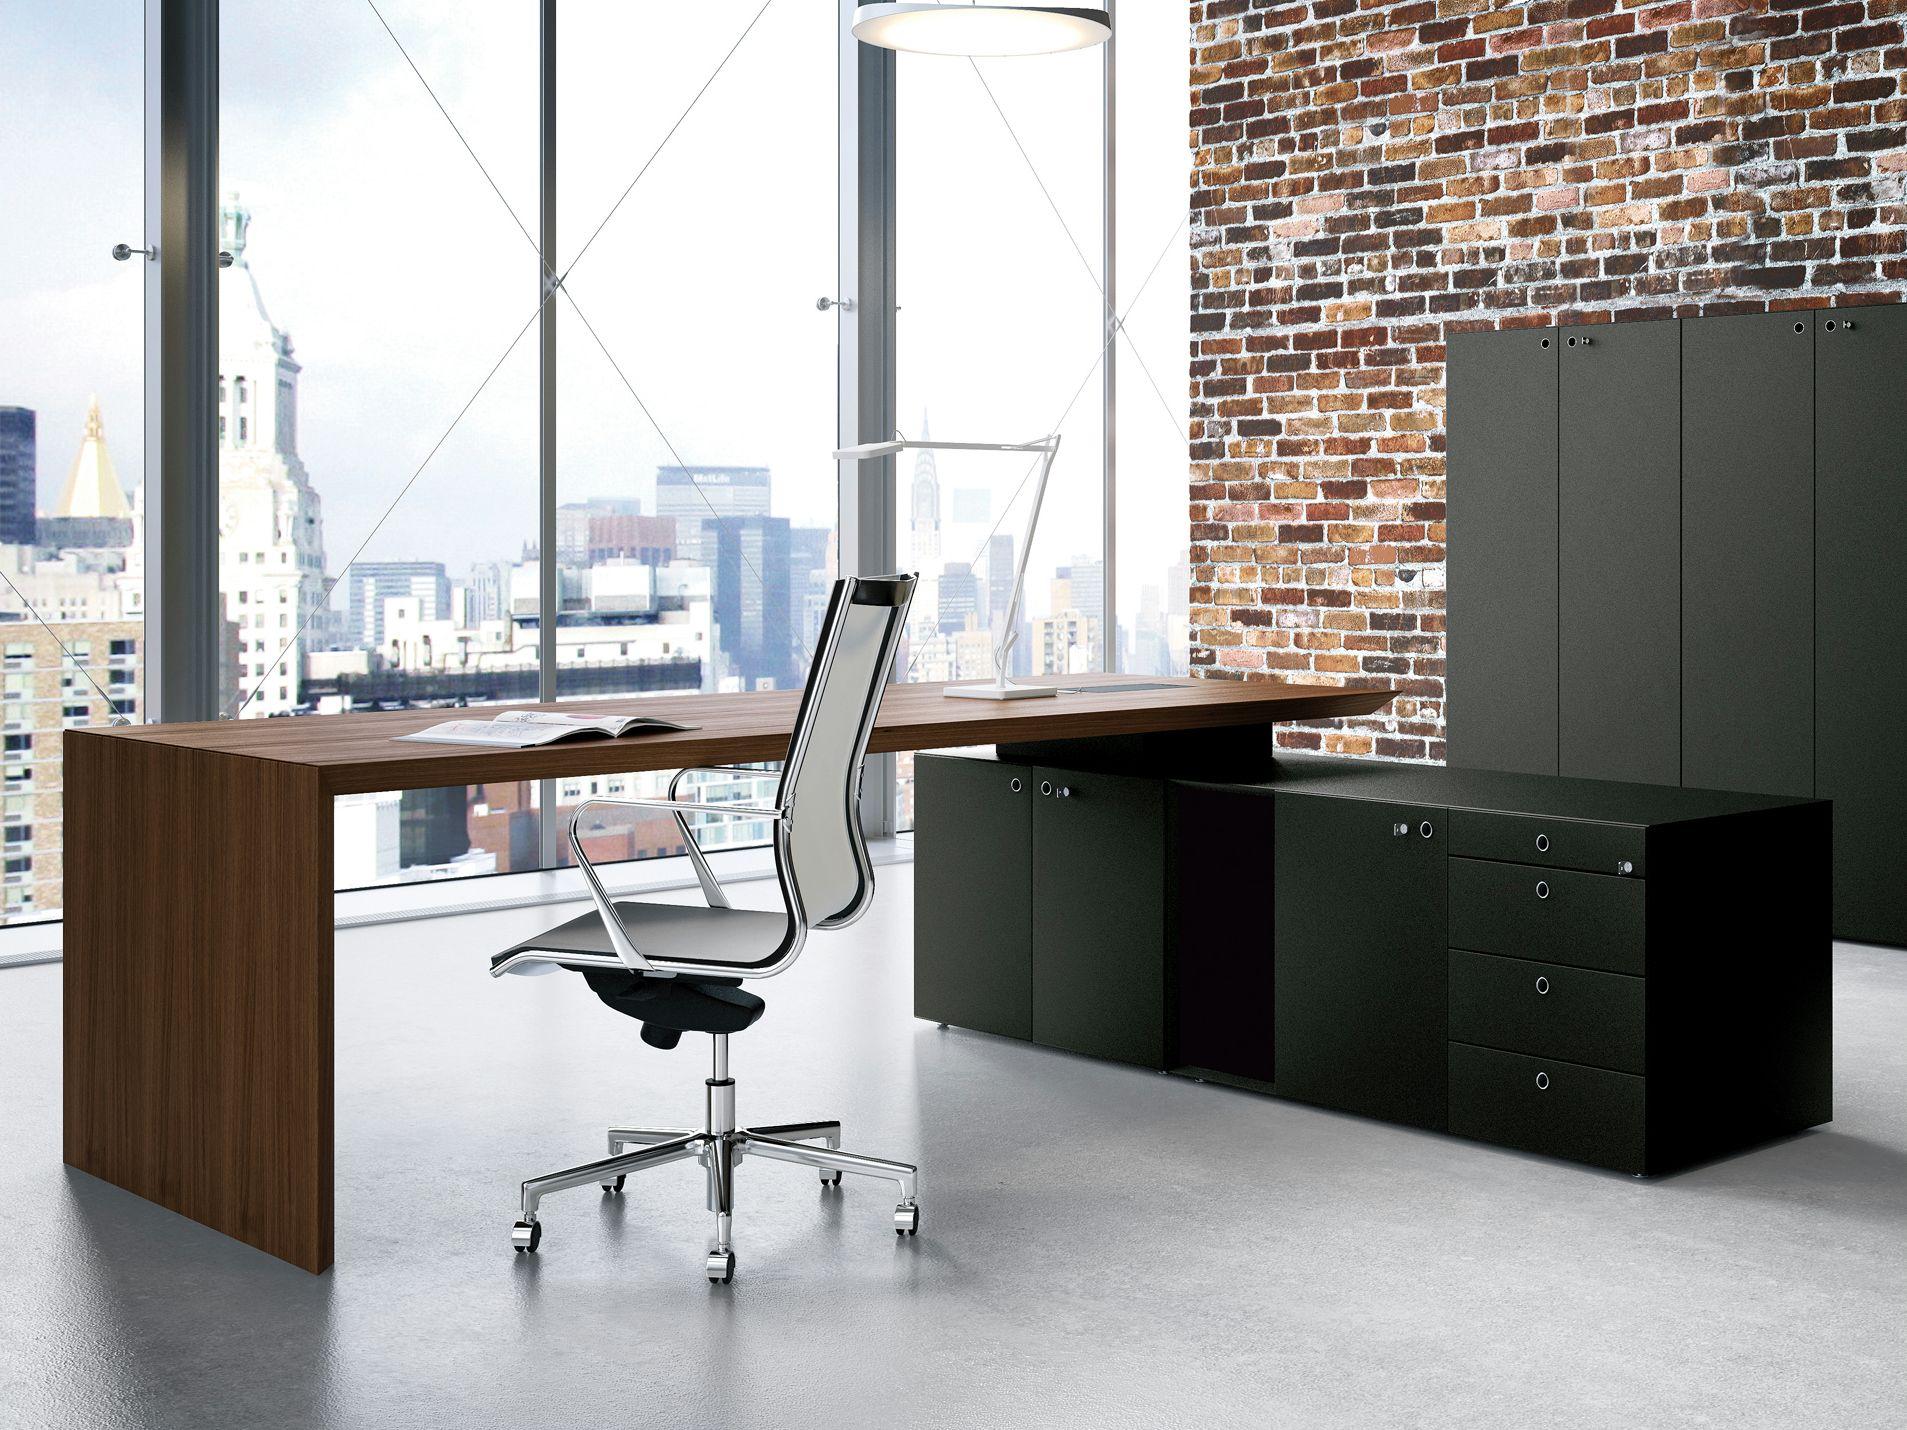 Multipliceo Office Desk By Fantoni For Design Ideas Pinterest  # Muebles Fantoni